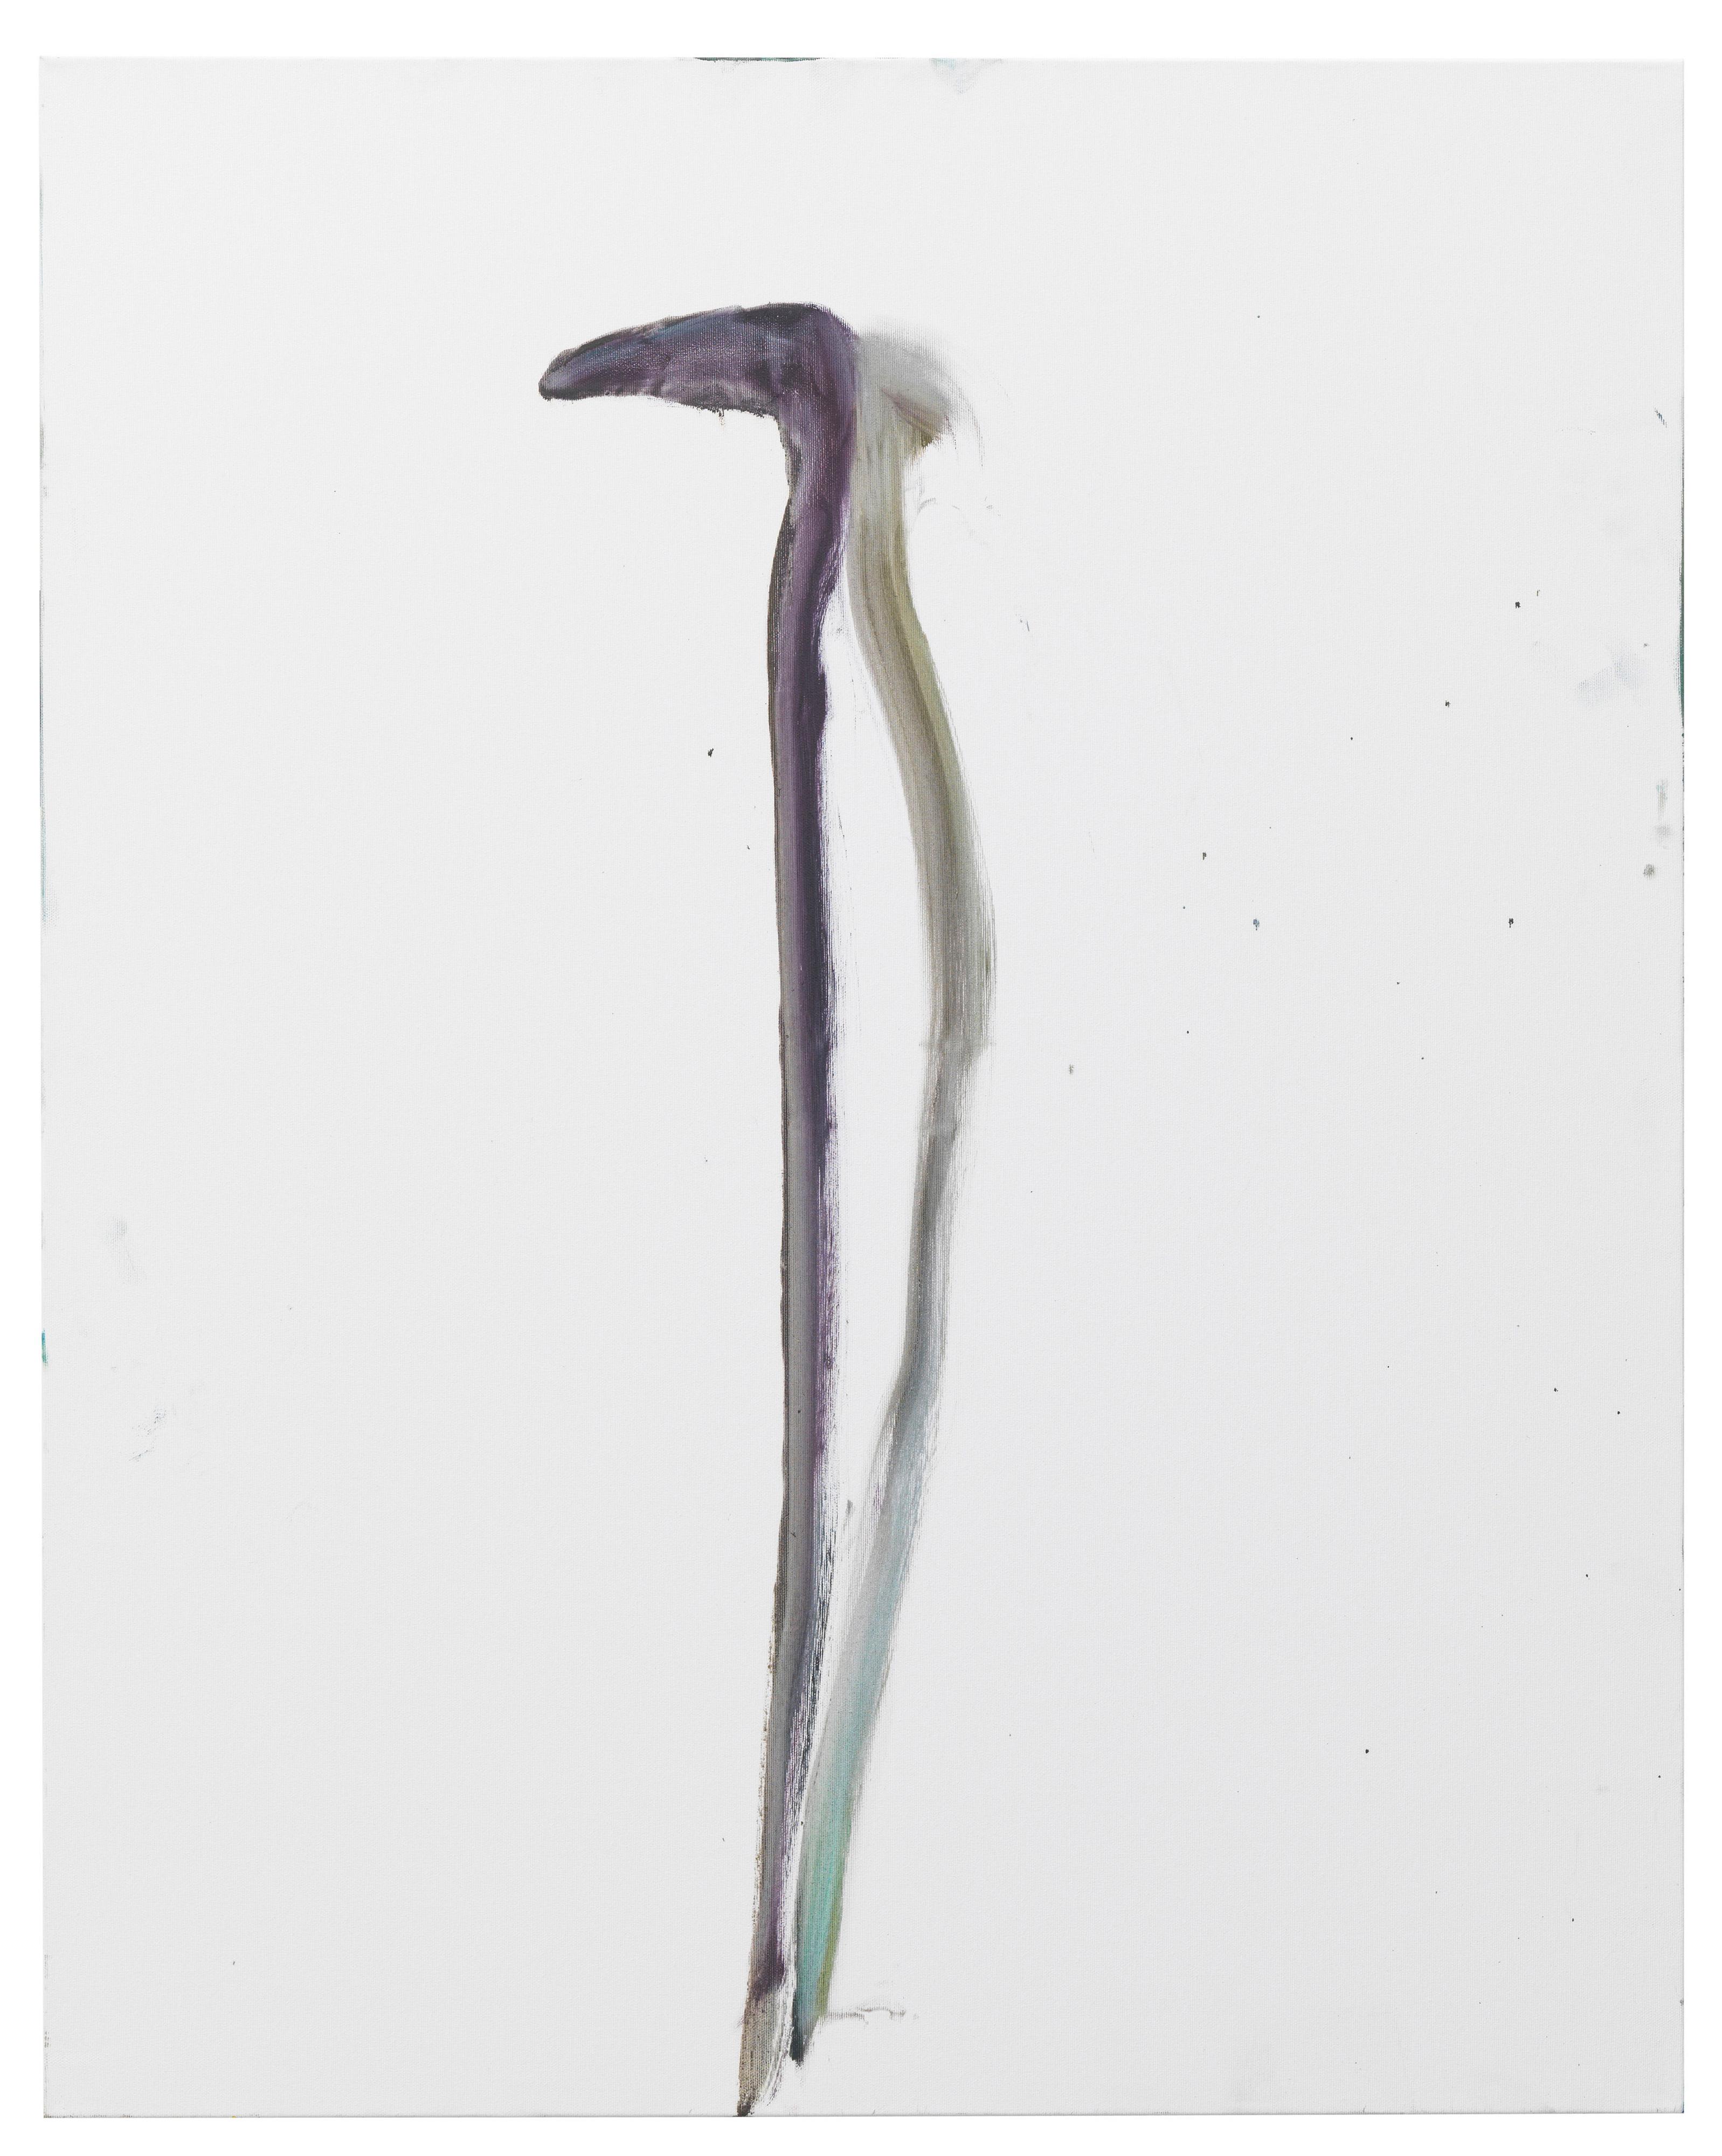 Galerie Barbara Thumm \ Simon Cantemir Hausì – What Do You See? \ Oil on canvas (2012)